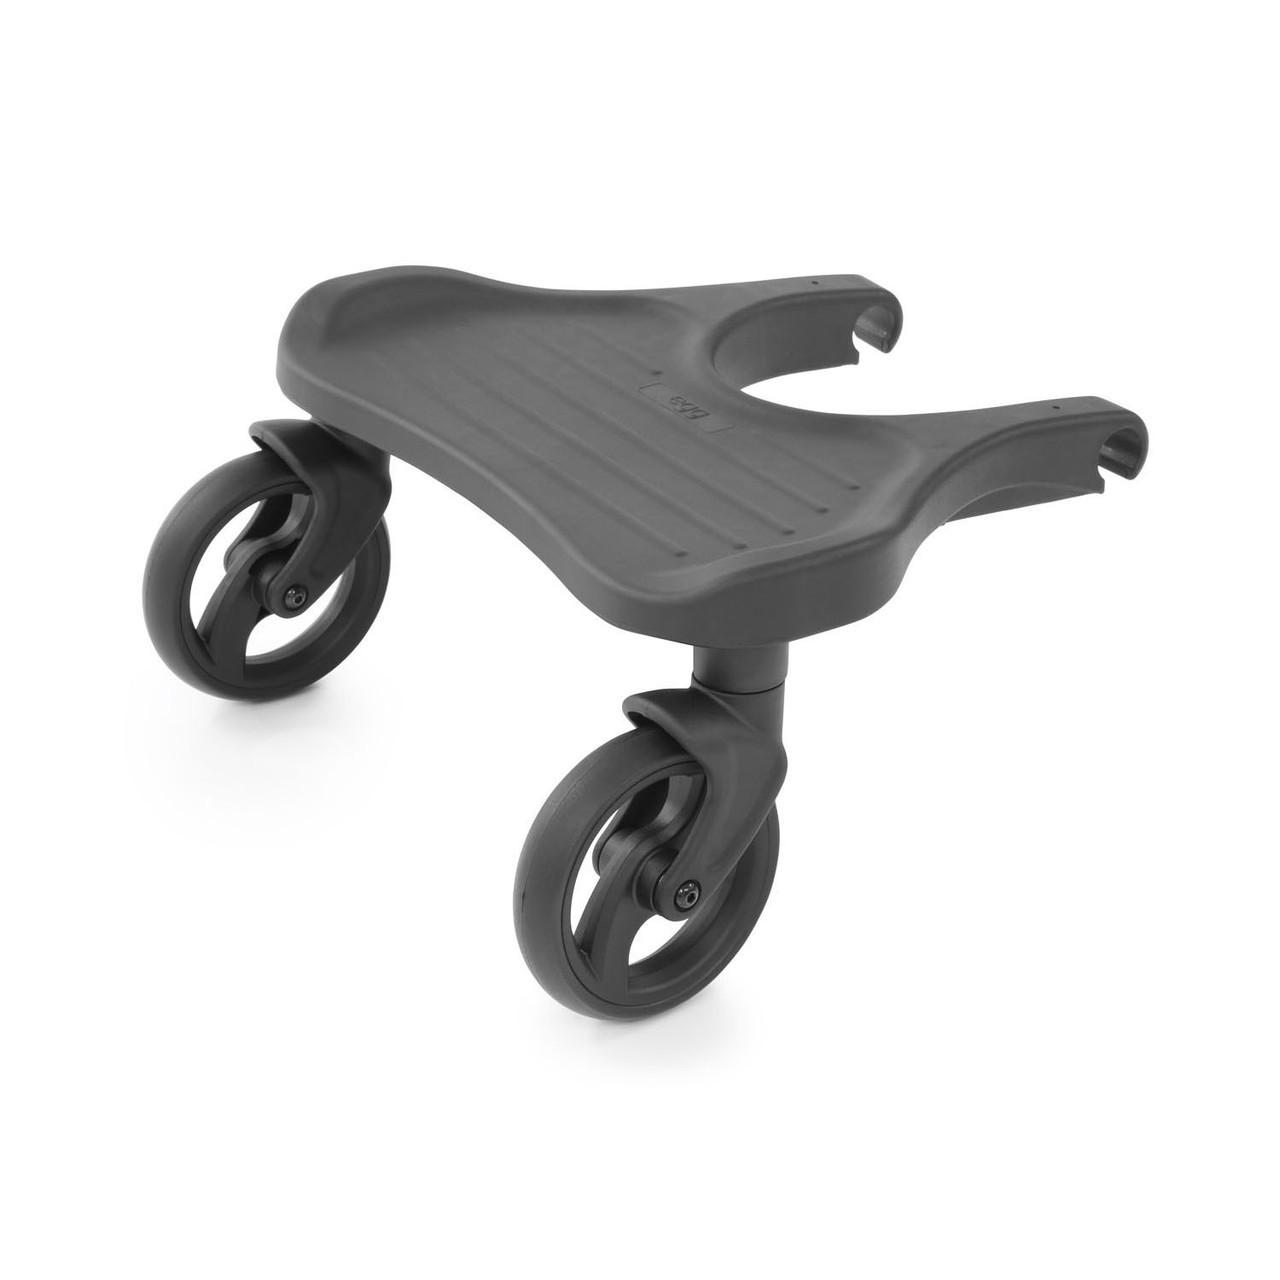 Подножка для ребенка Rider on Board для коляски Egg